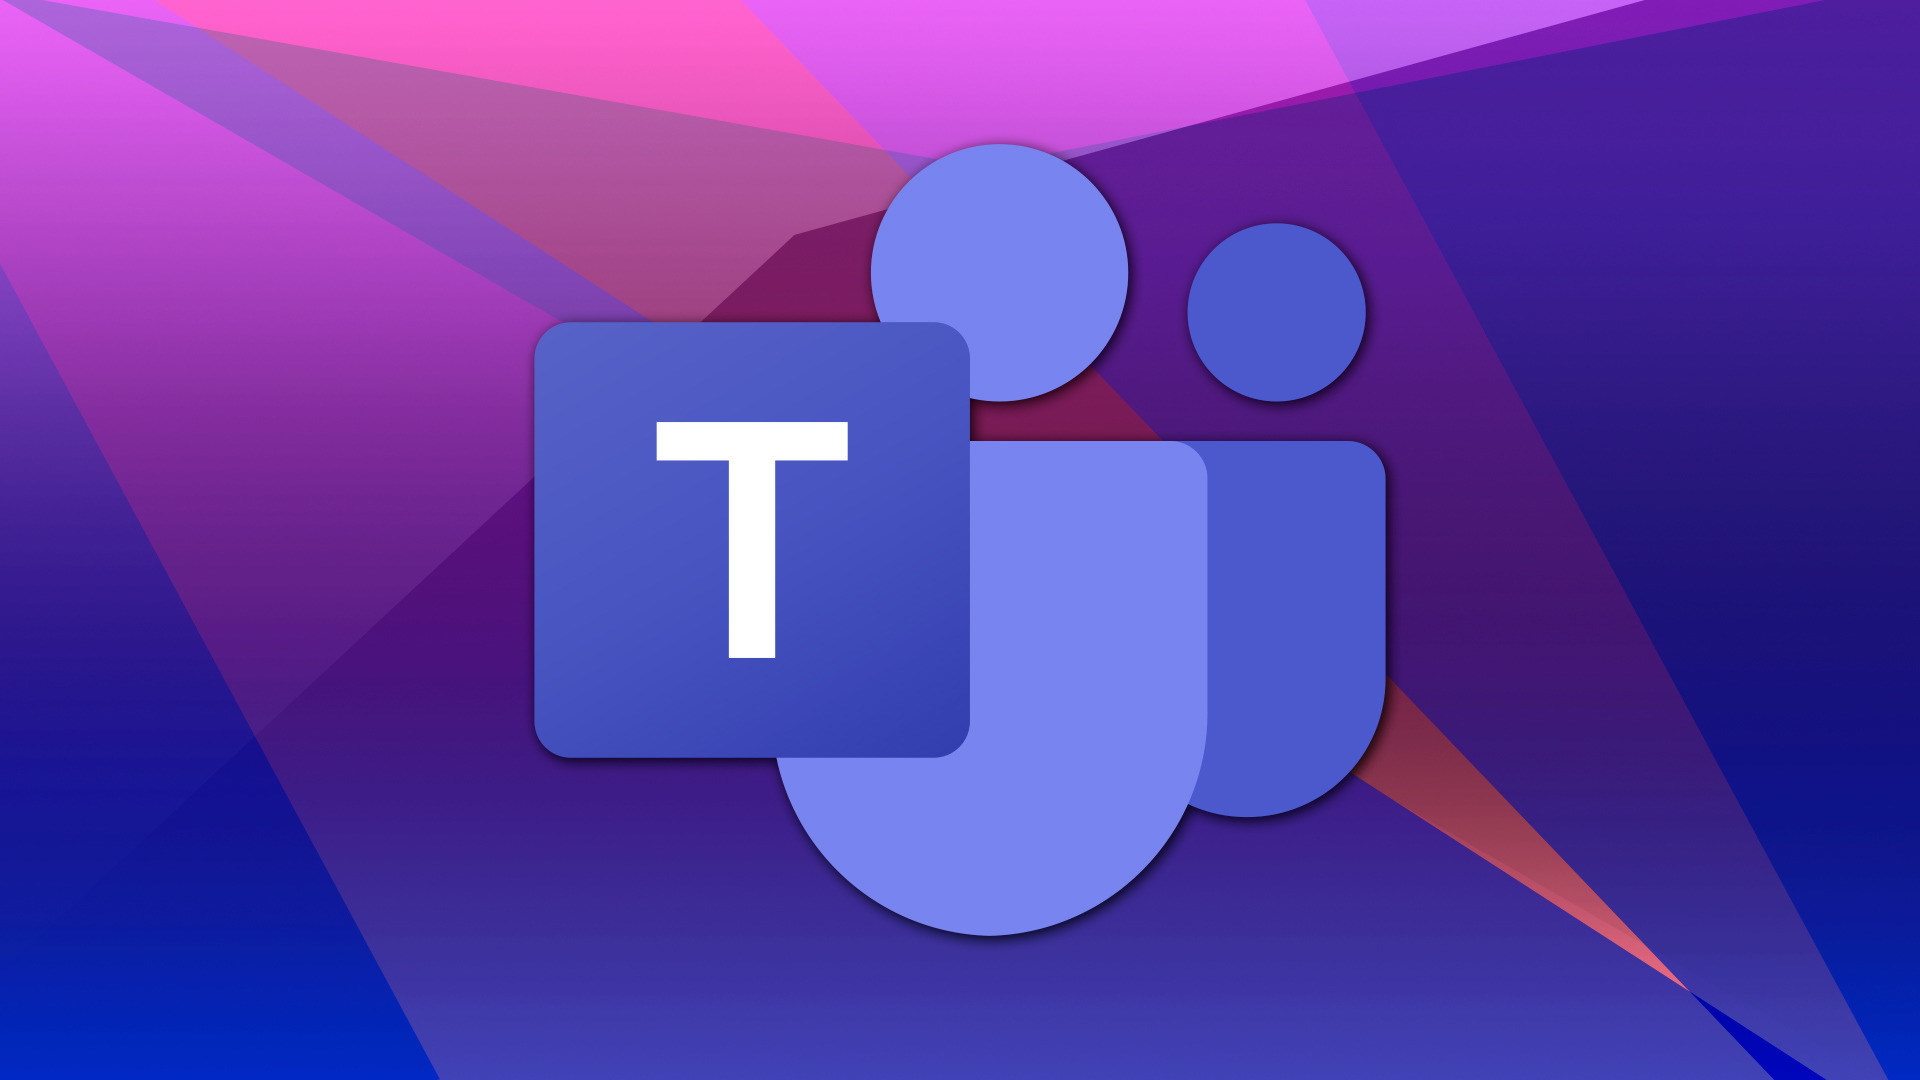 Office, Chat, Office 365, microsoft 365, Microsoft Teams, Teams, Microsoft Teams Logo